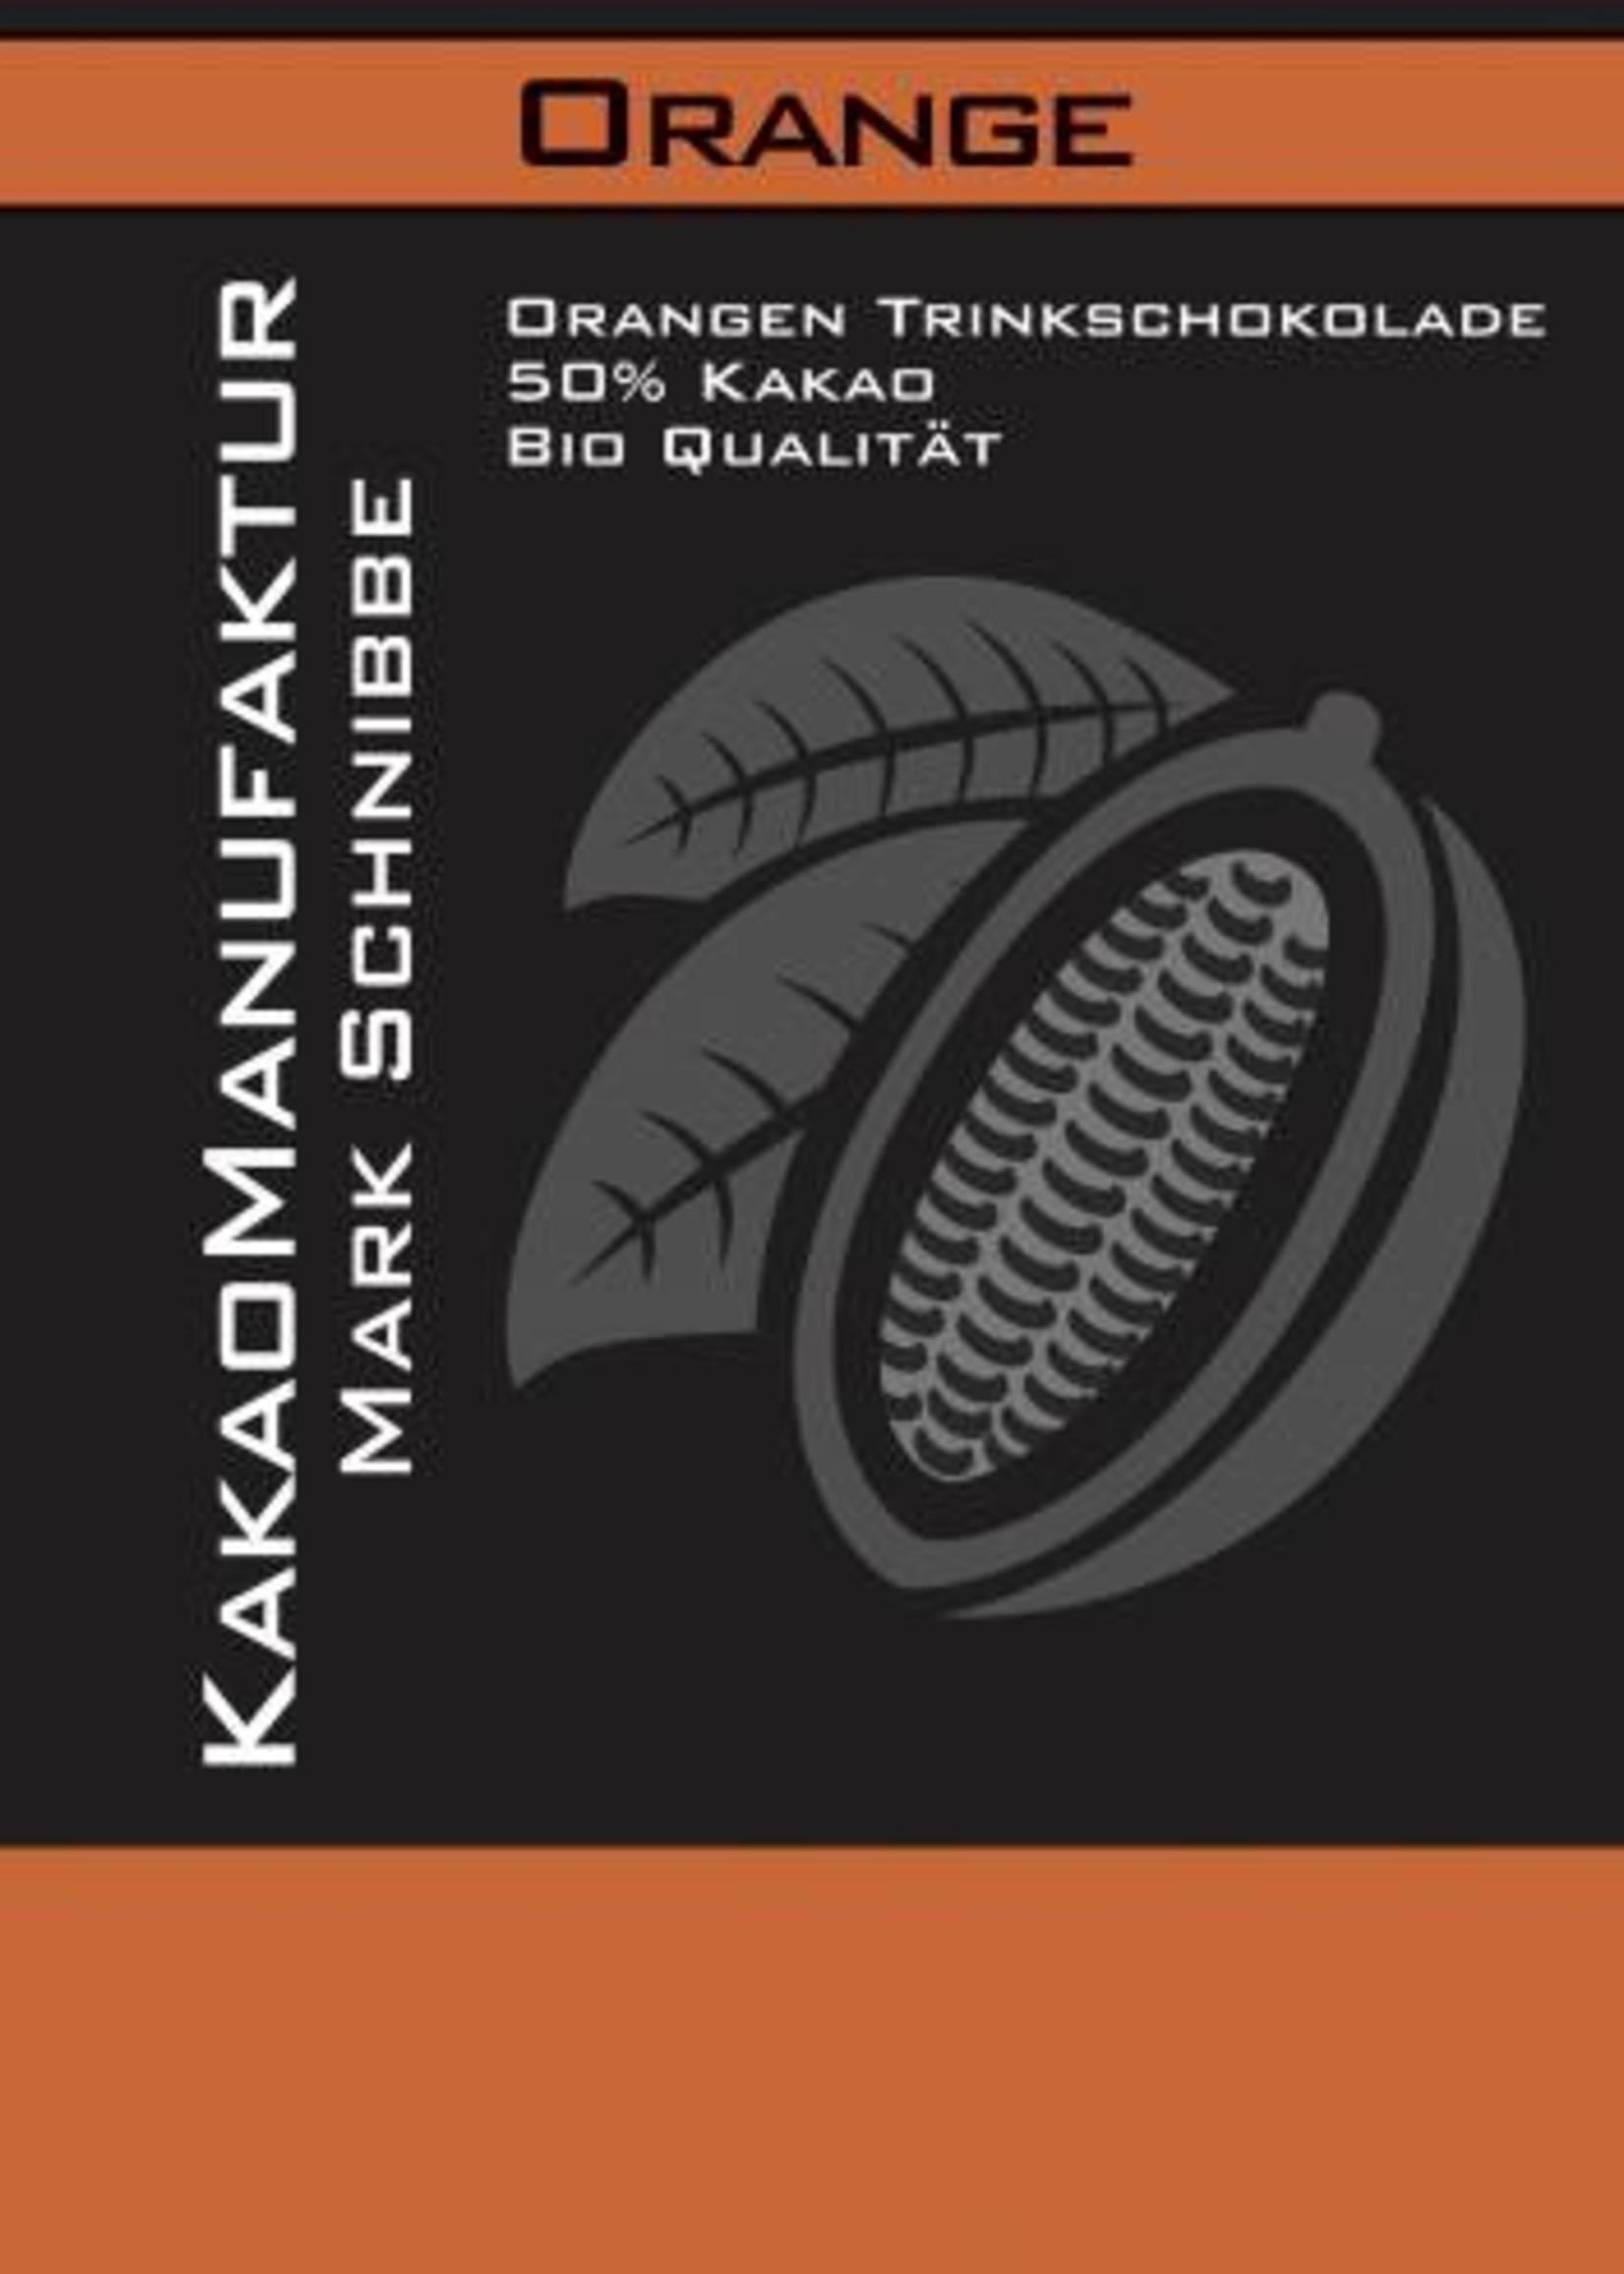 Bio Vegan Orange-Kakao 50%